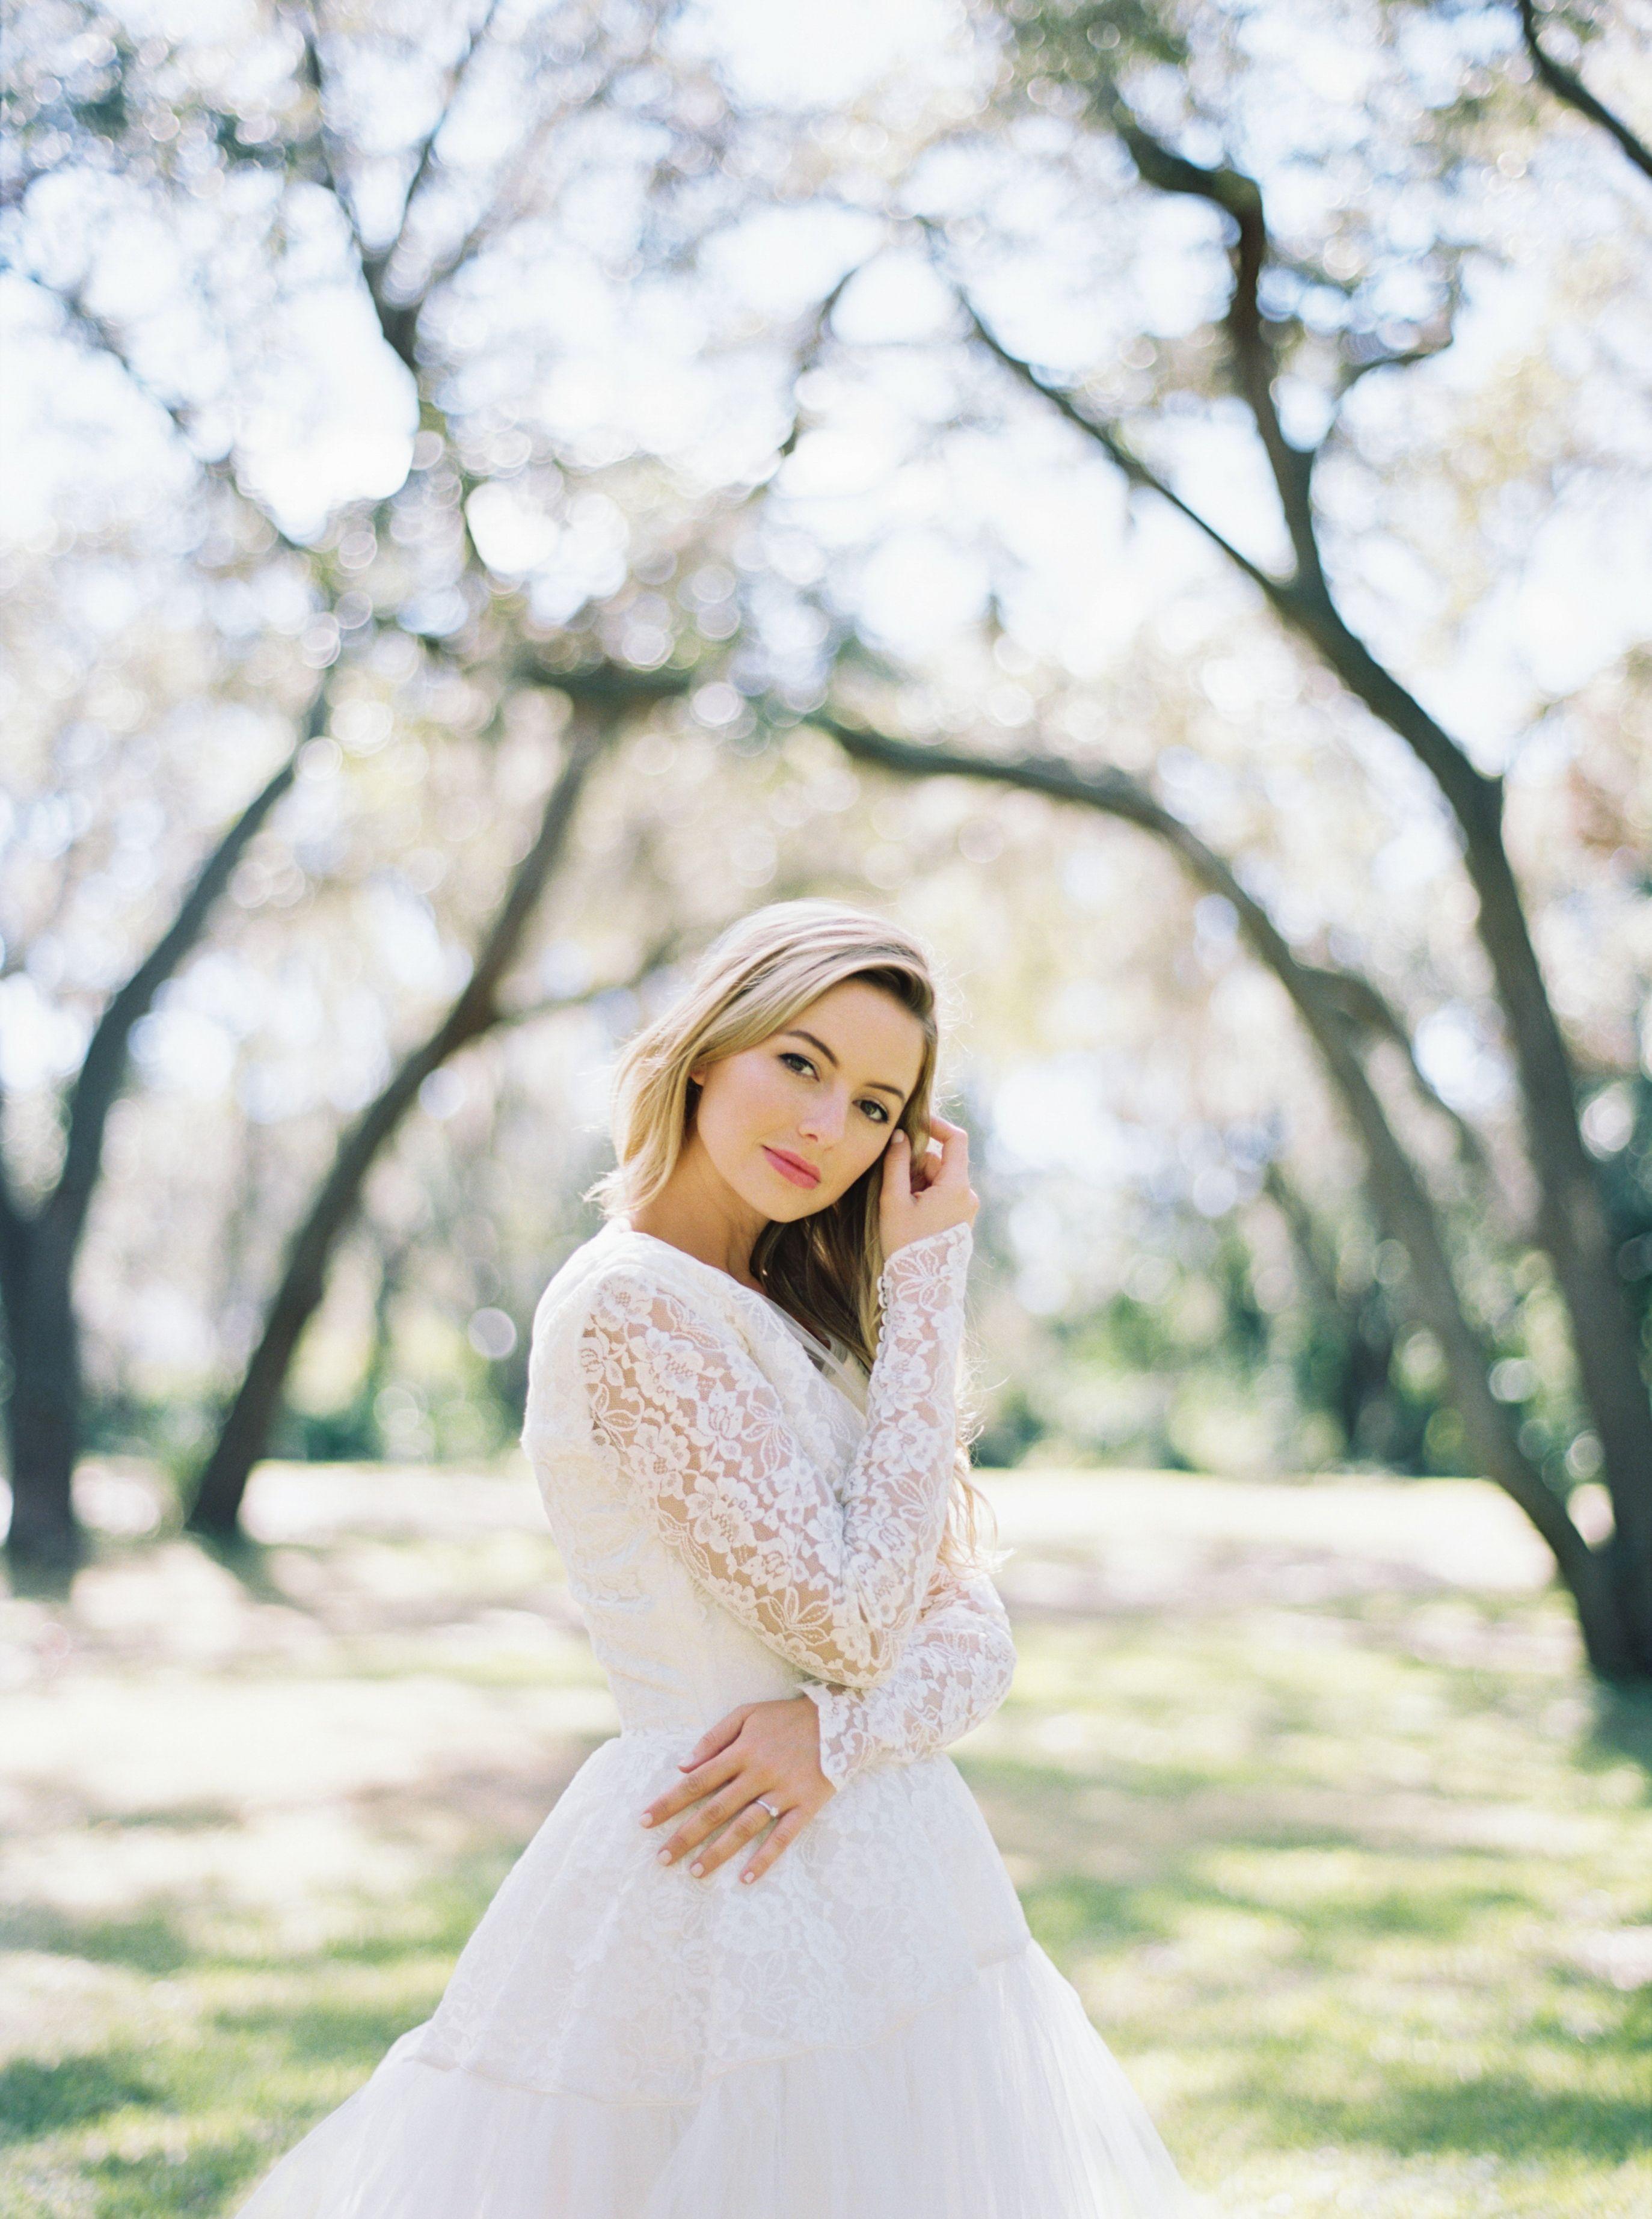 Long Sleeved Wedding Dress Fine Art Bridal Portrait Wedding